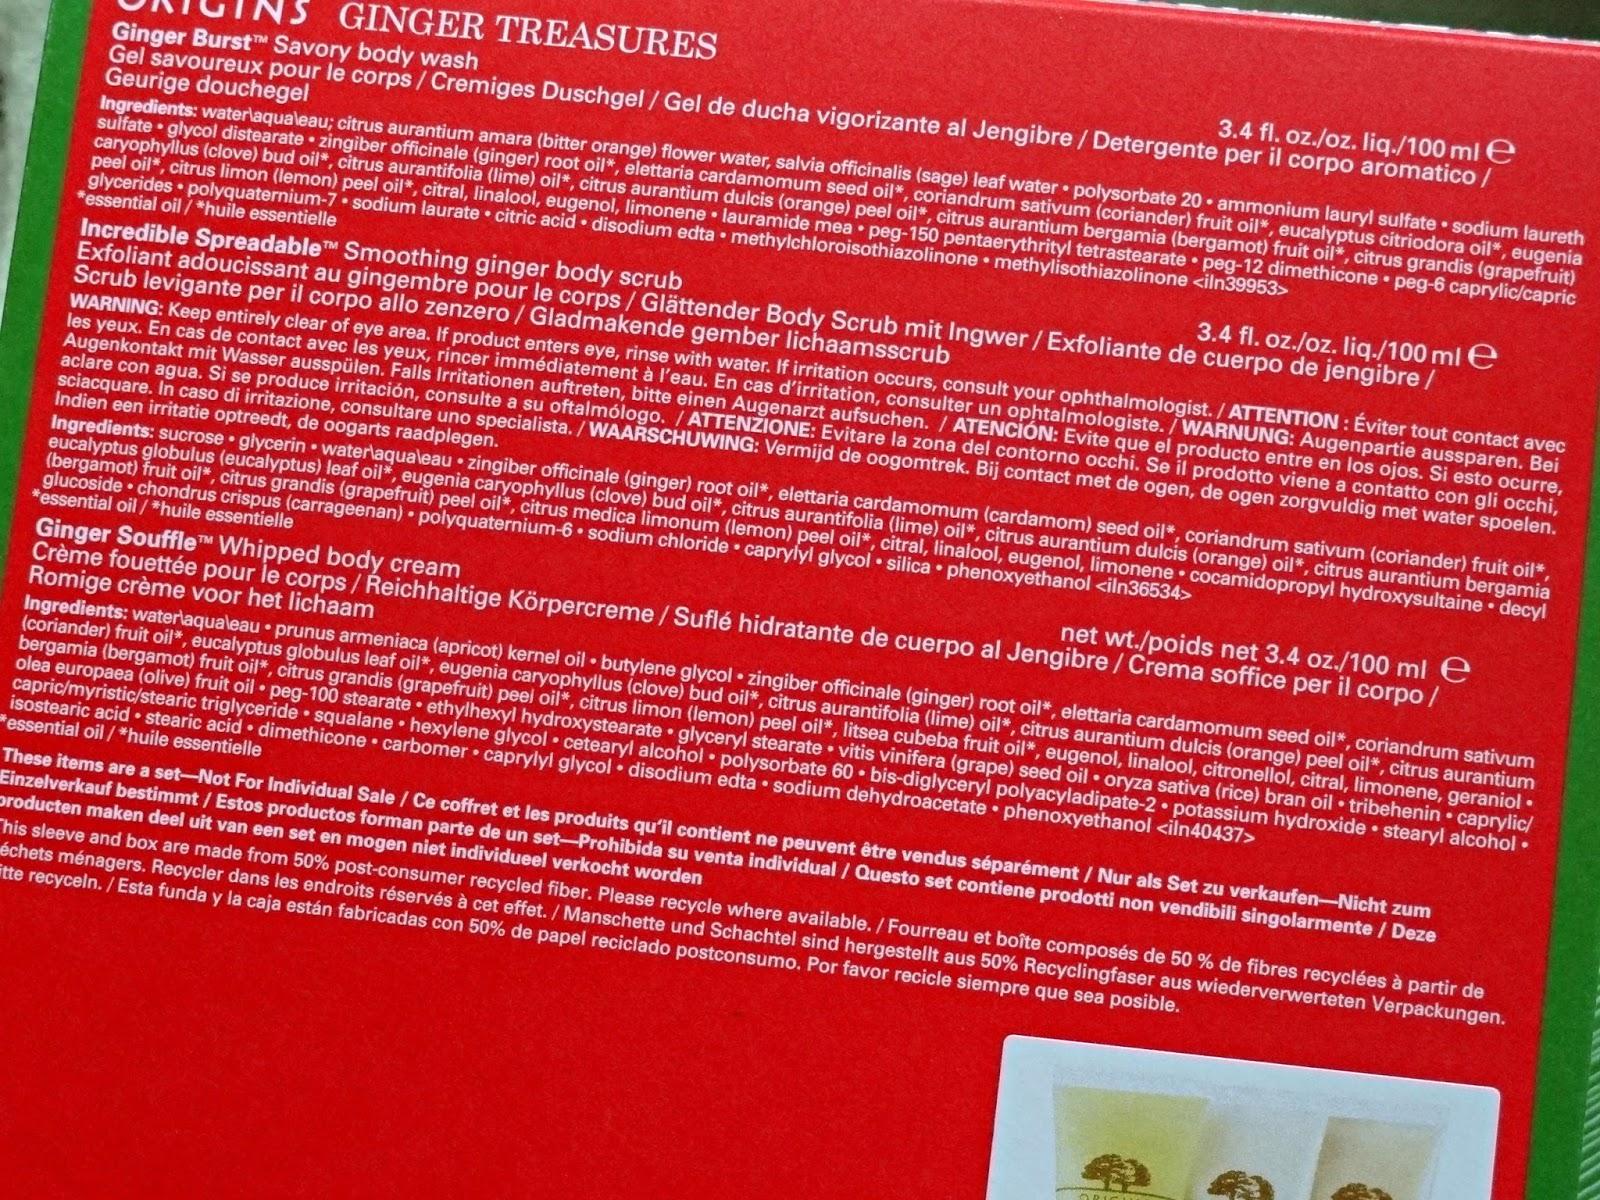 Origins Ginger Treasures Bath and Body Set Ingredients